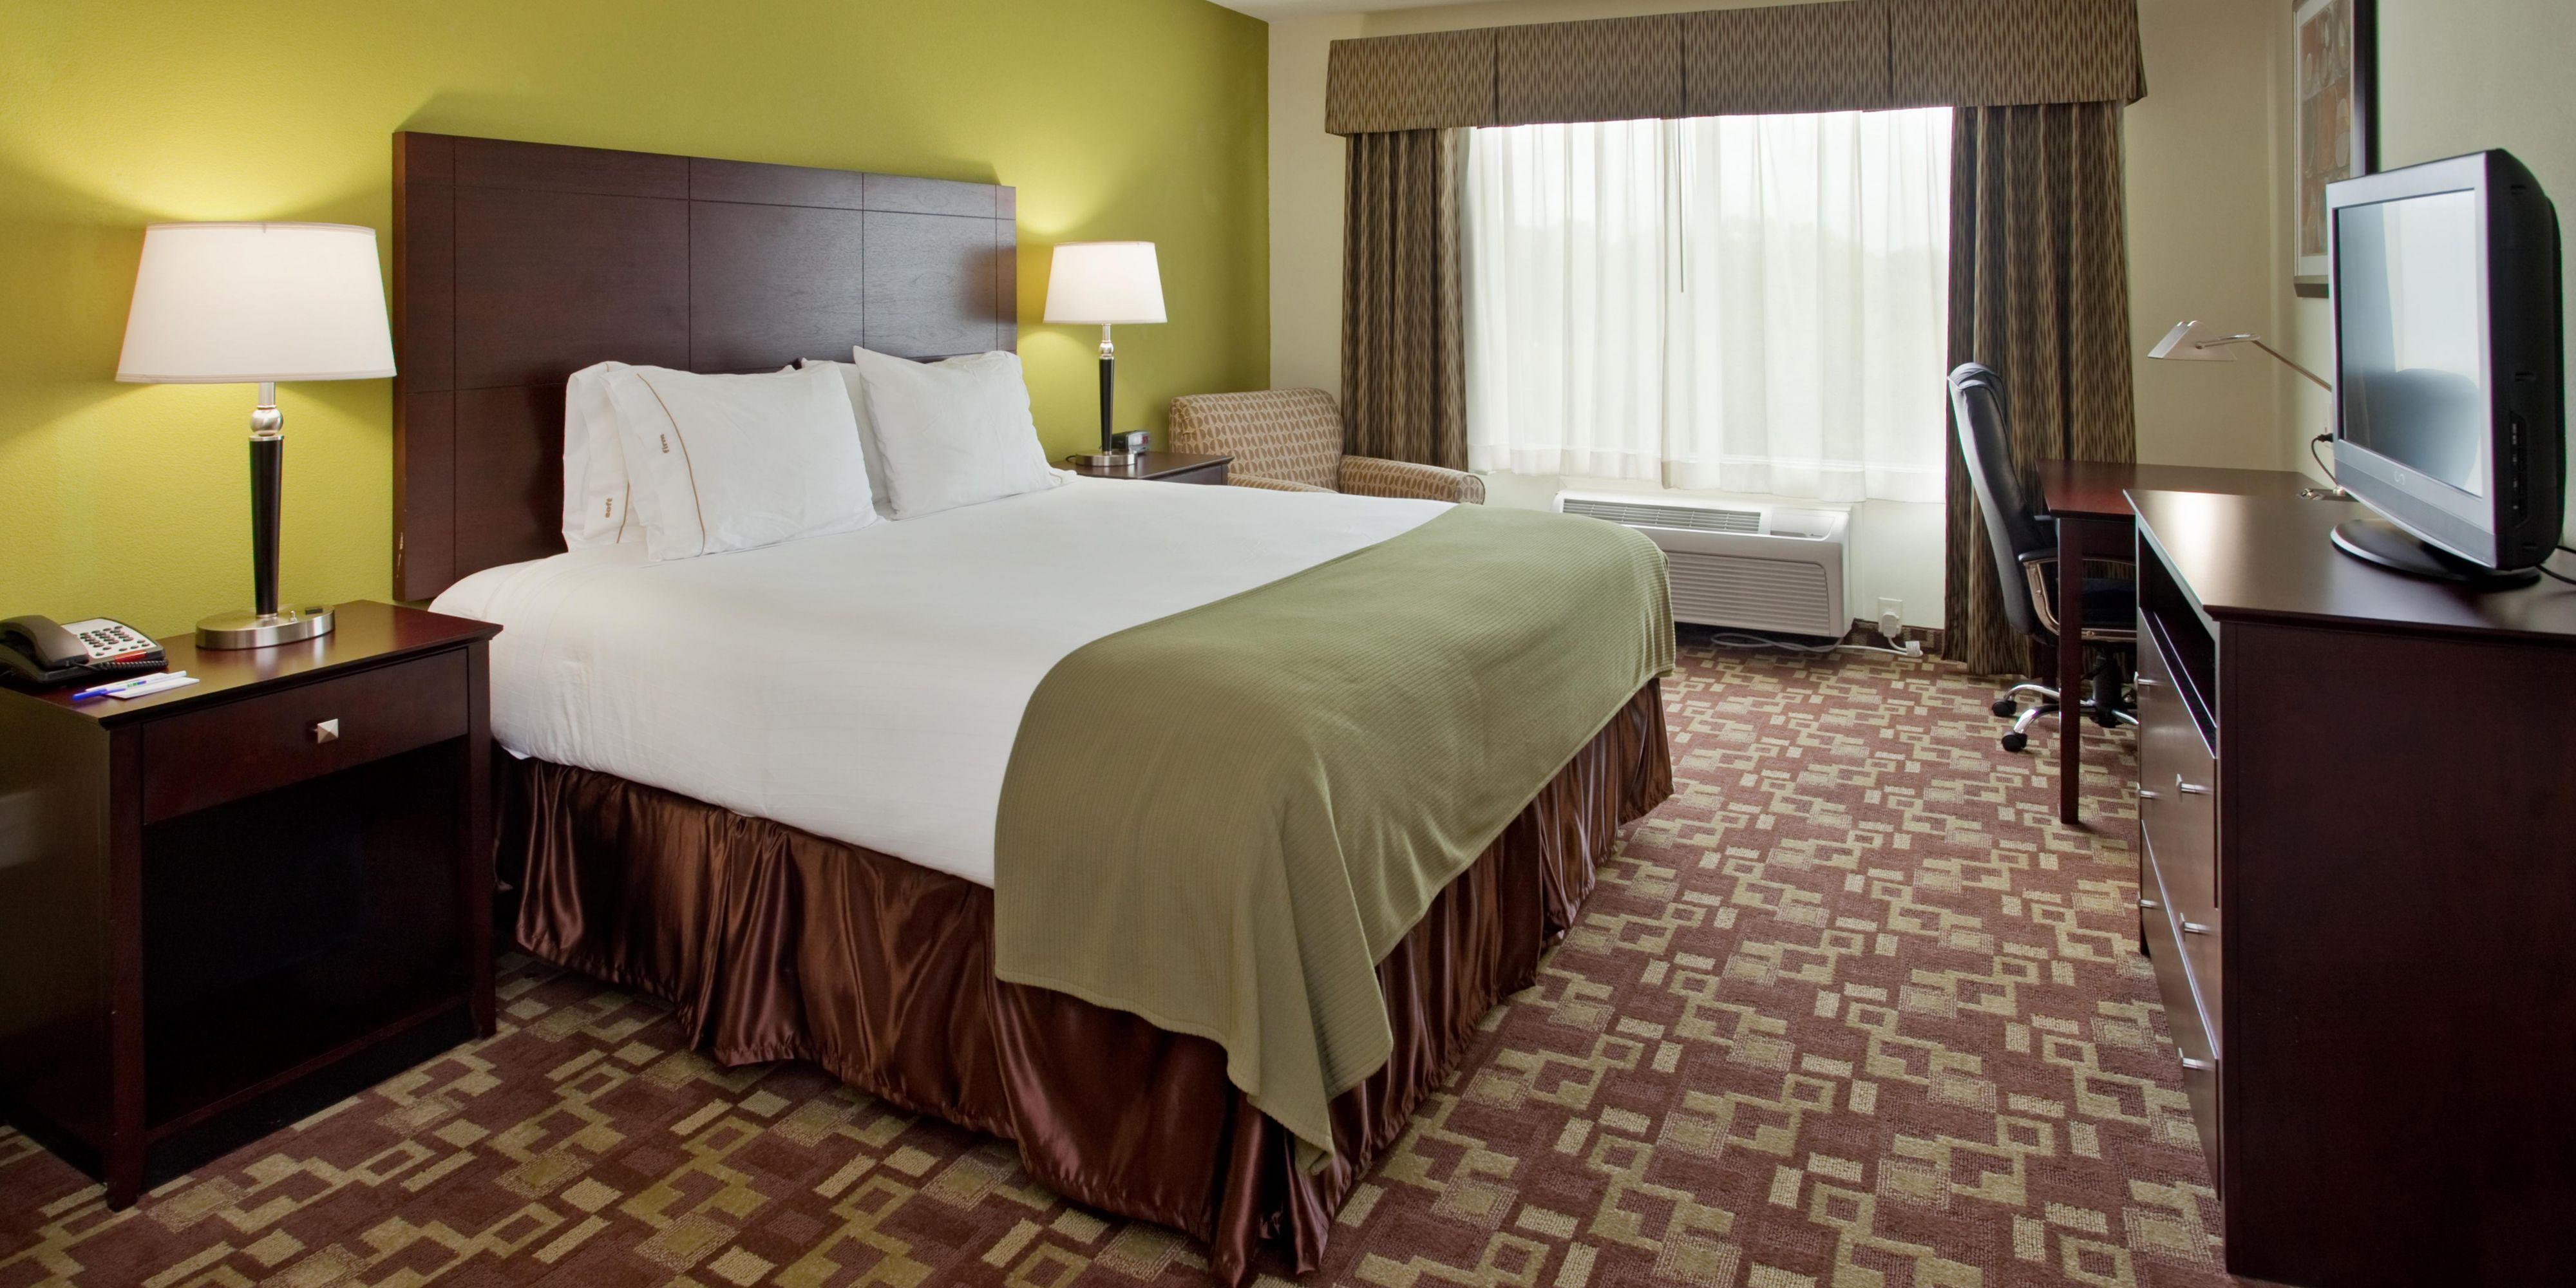 Holiday Inn Express And Suites Kansas City 4185013654